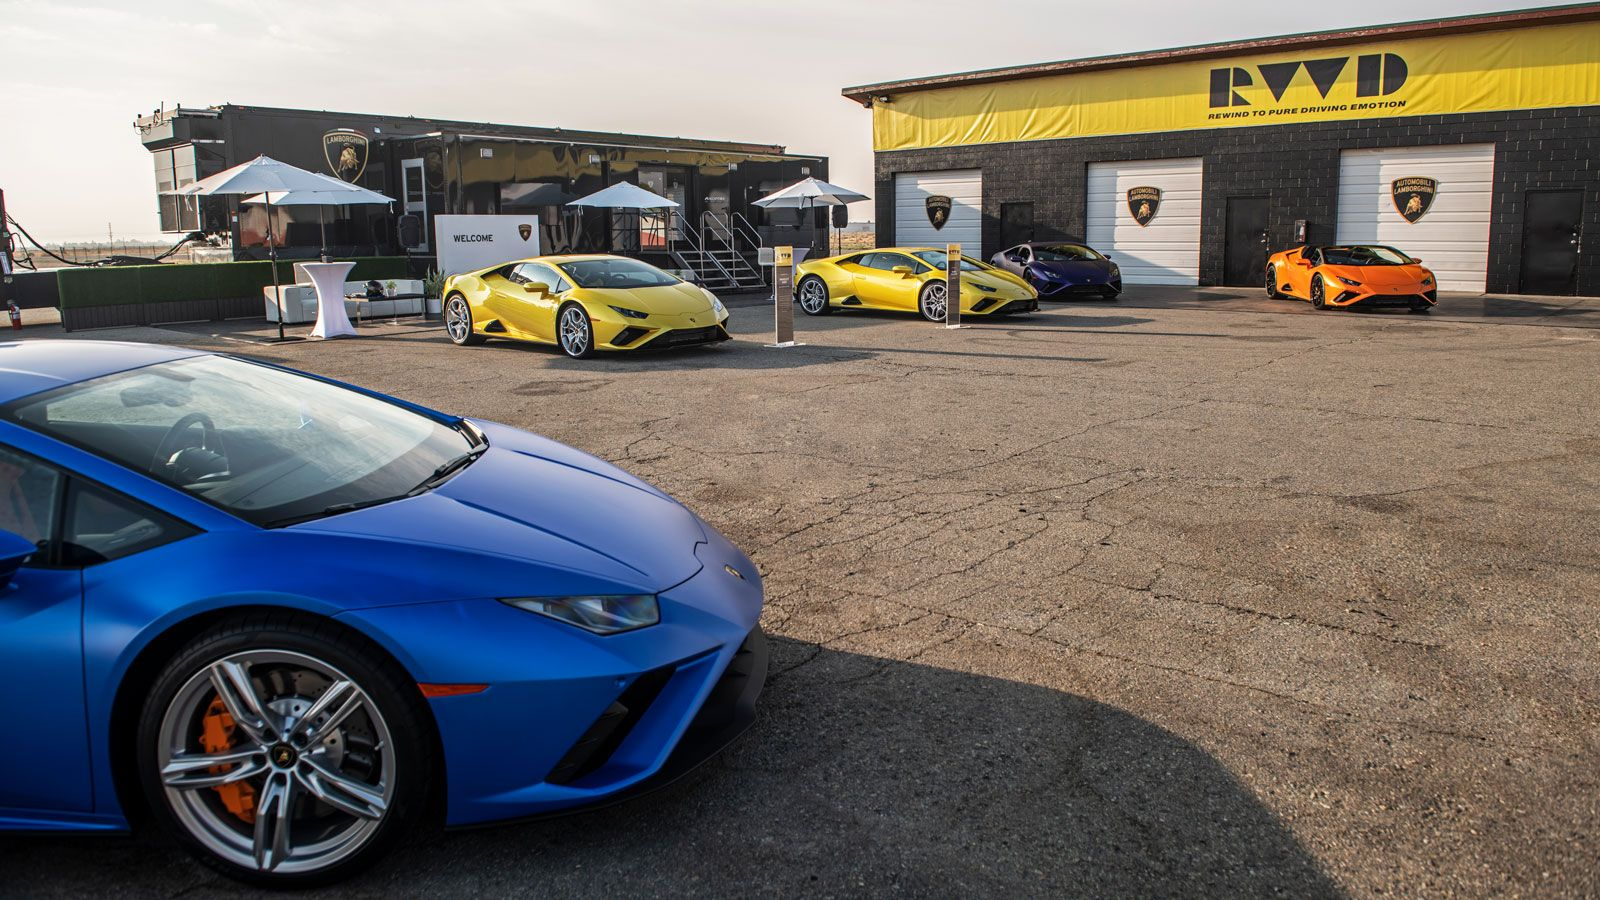 Lamborghini event branding signs